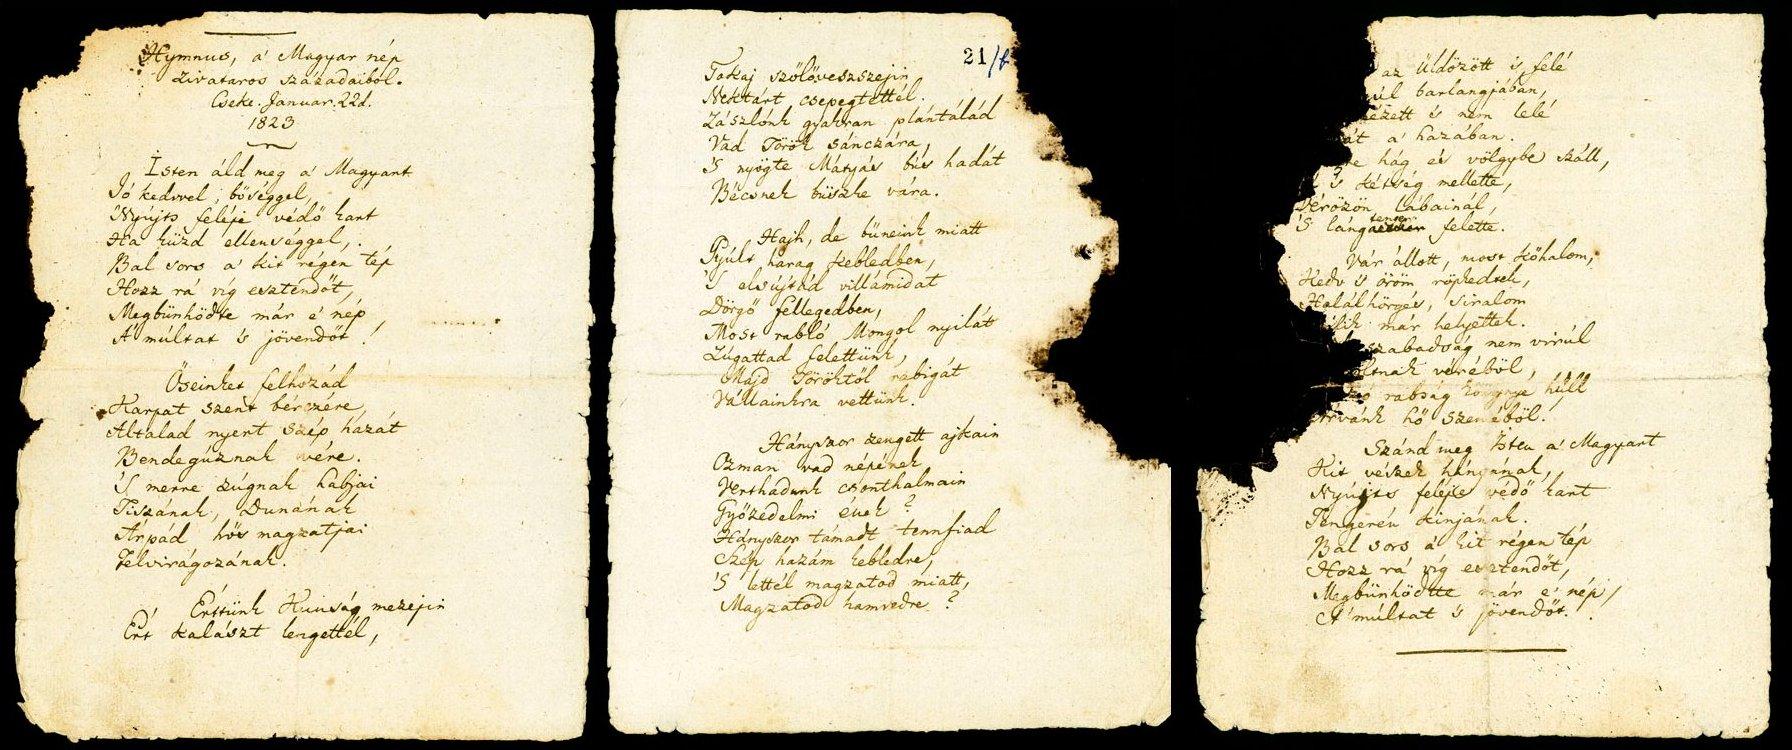 hymnus_1823.jpg